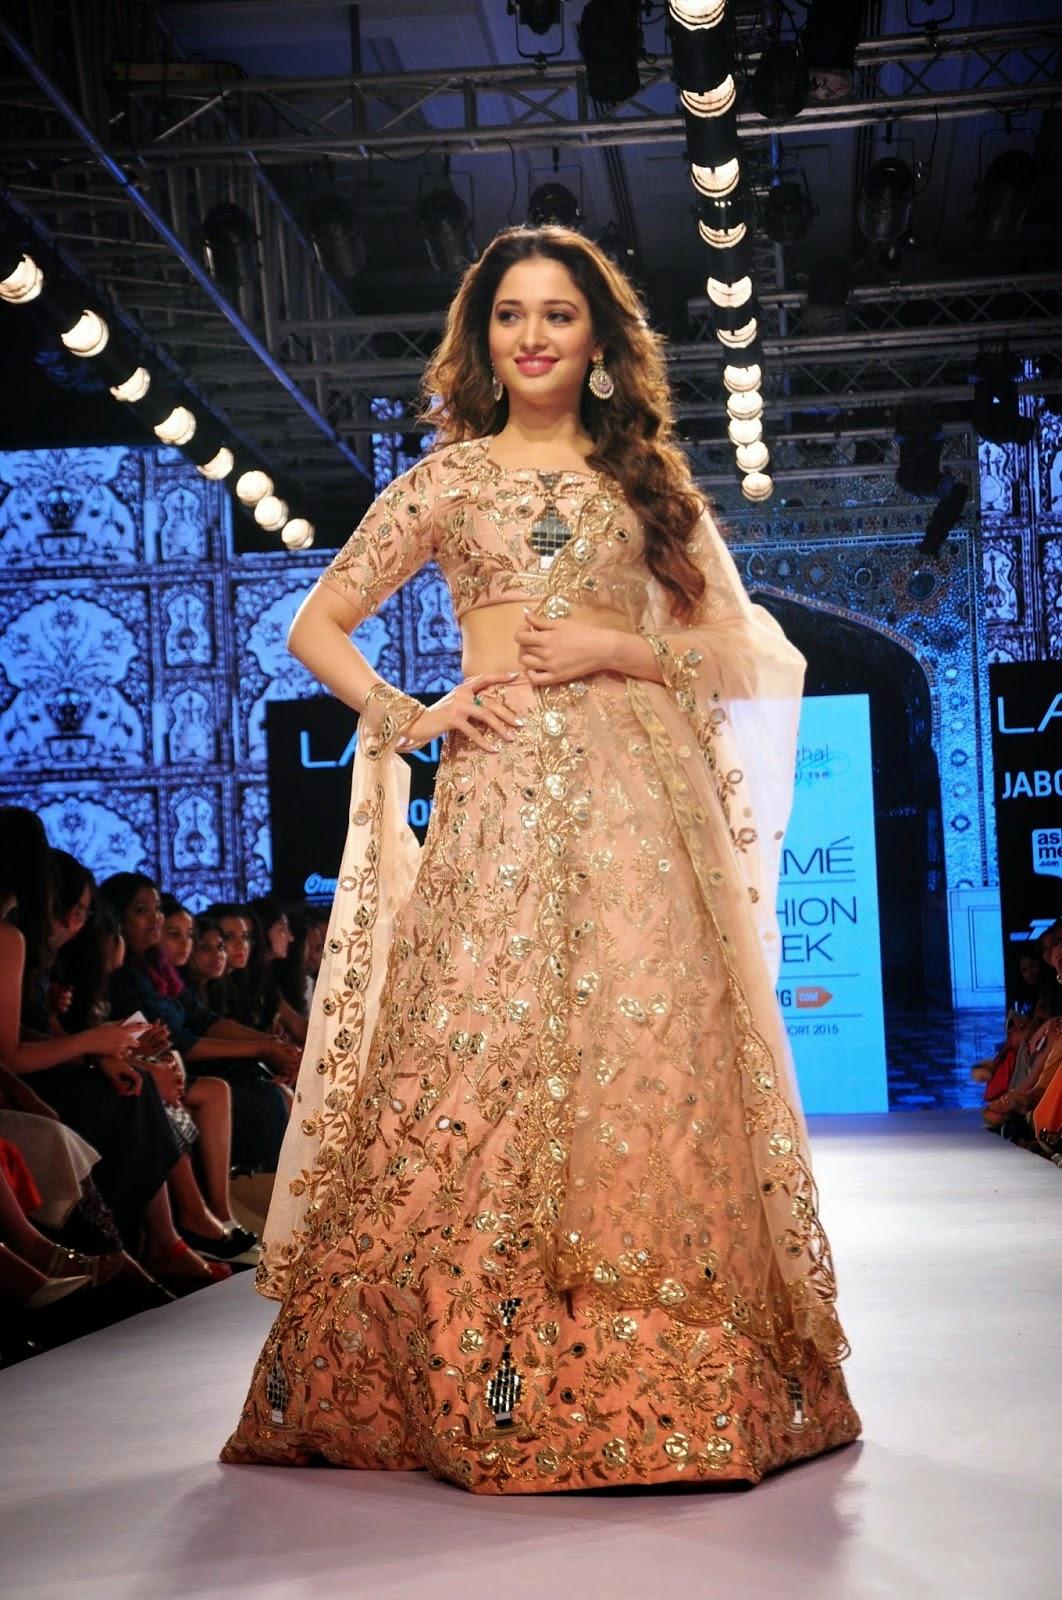 Tamanna Latest Photos At Lakme Fashion Week 2015 | Gallery